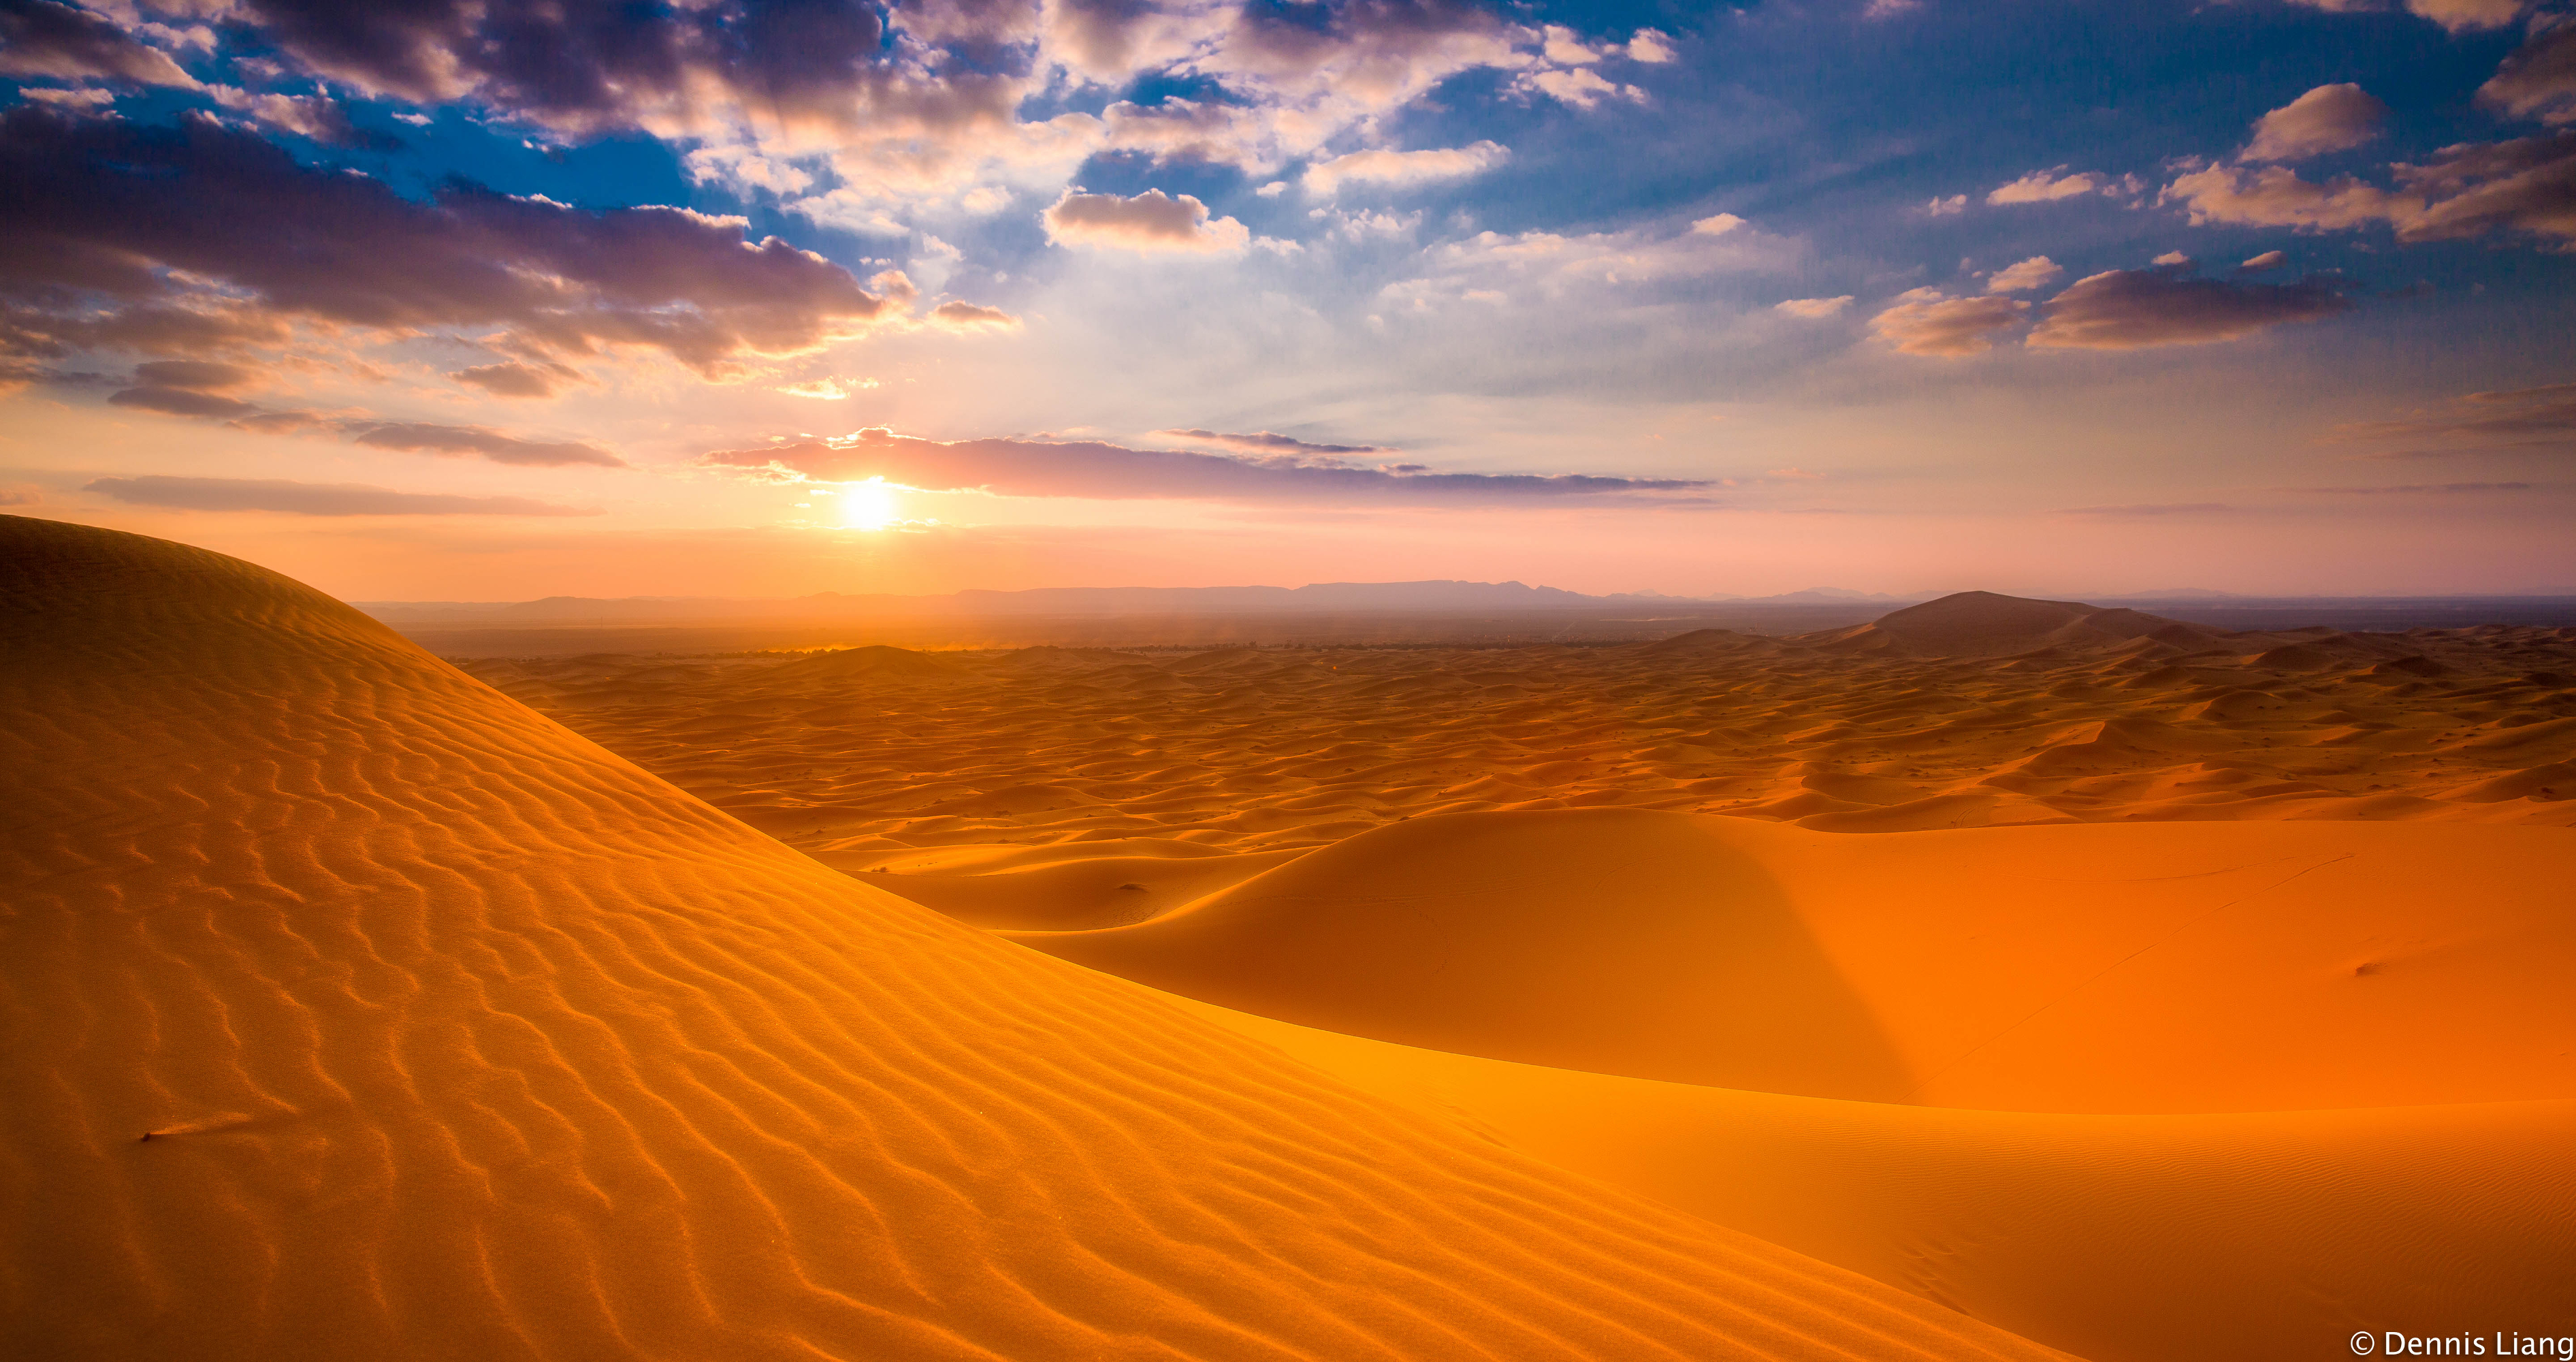 erg-chebbi-3784x2000-sahara-desert-morocco-4k-2854 (1)